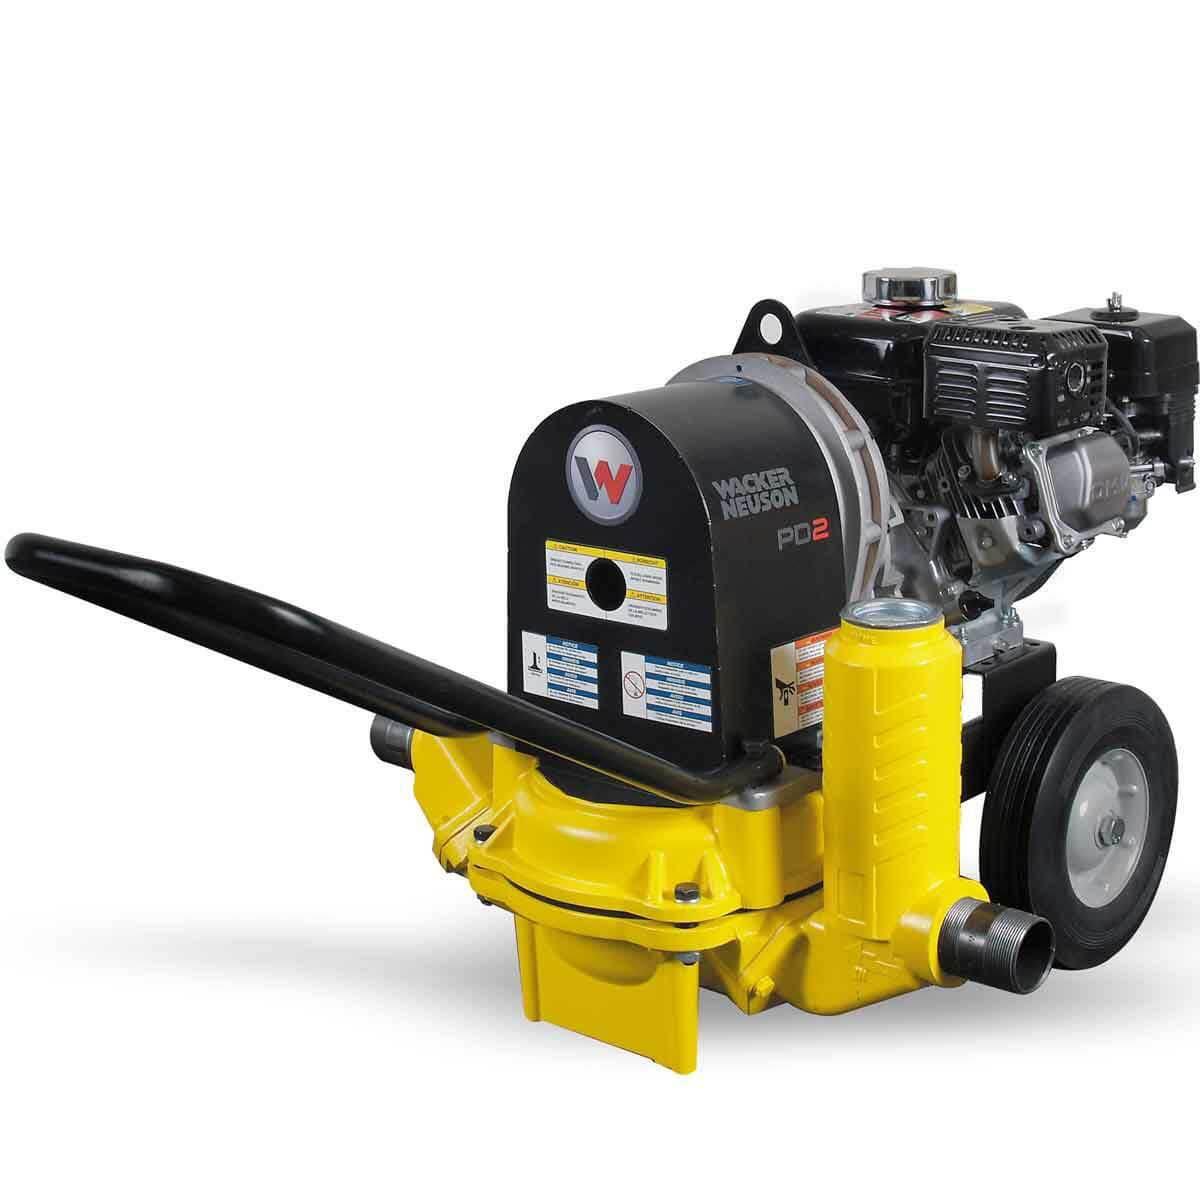 Wacker PDT2A Neuson 2 inch Diaphragm Trash Pump